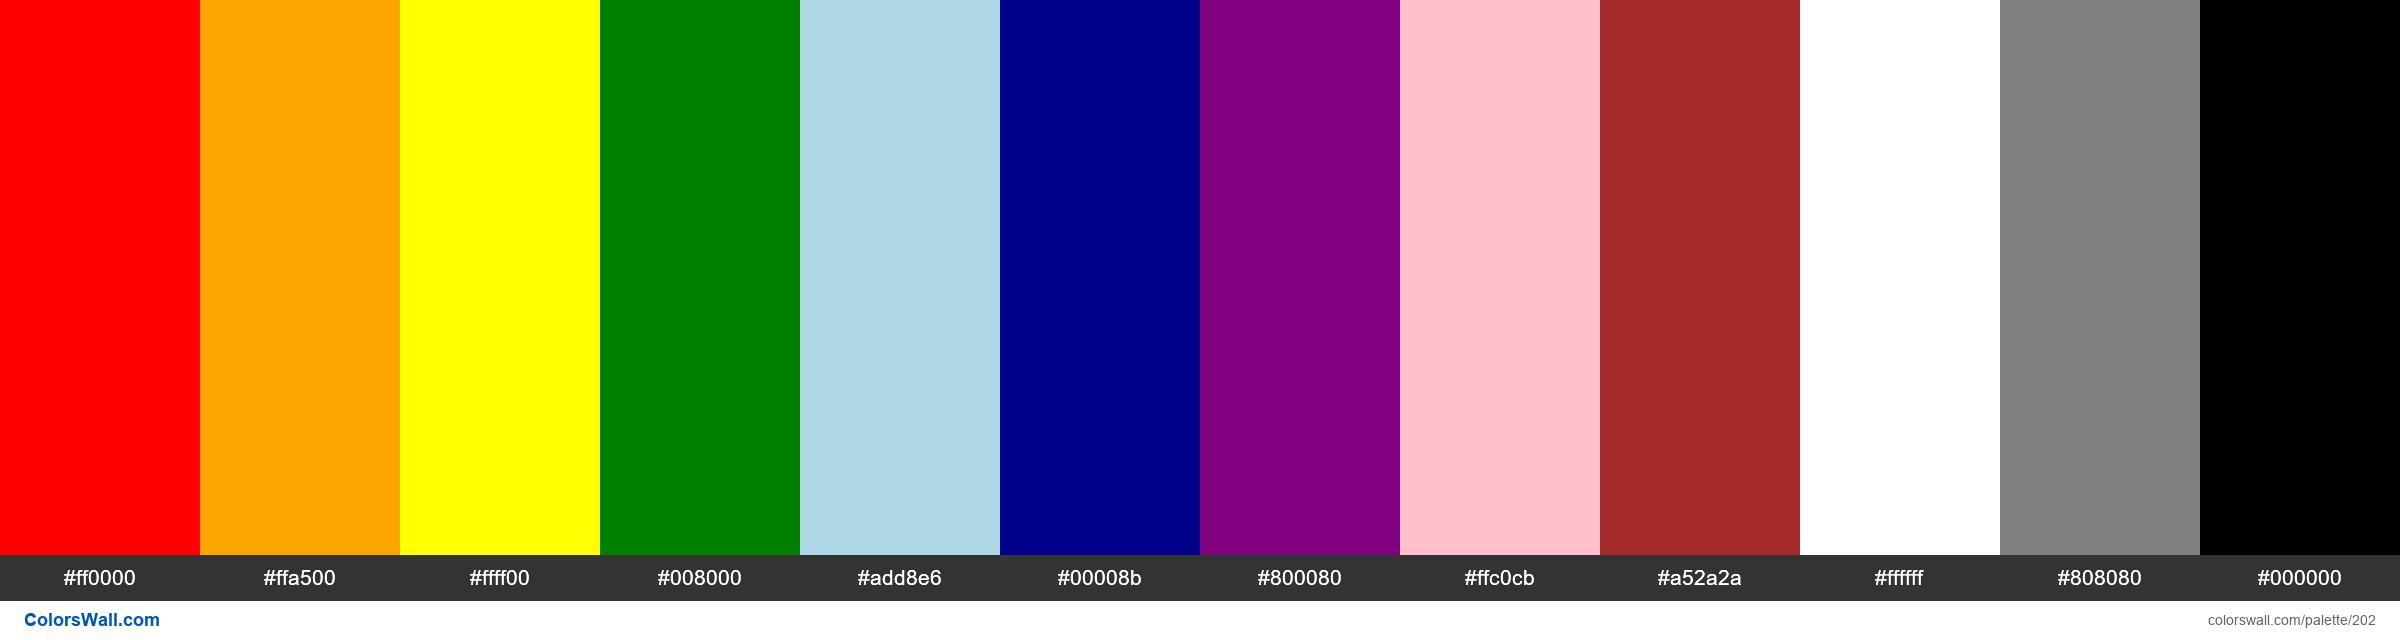 Emotional associations of colors - #202